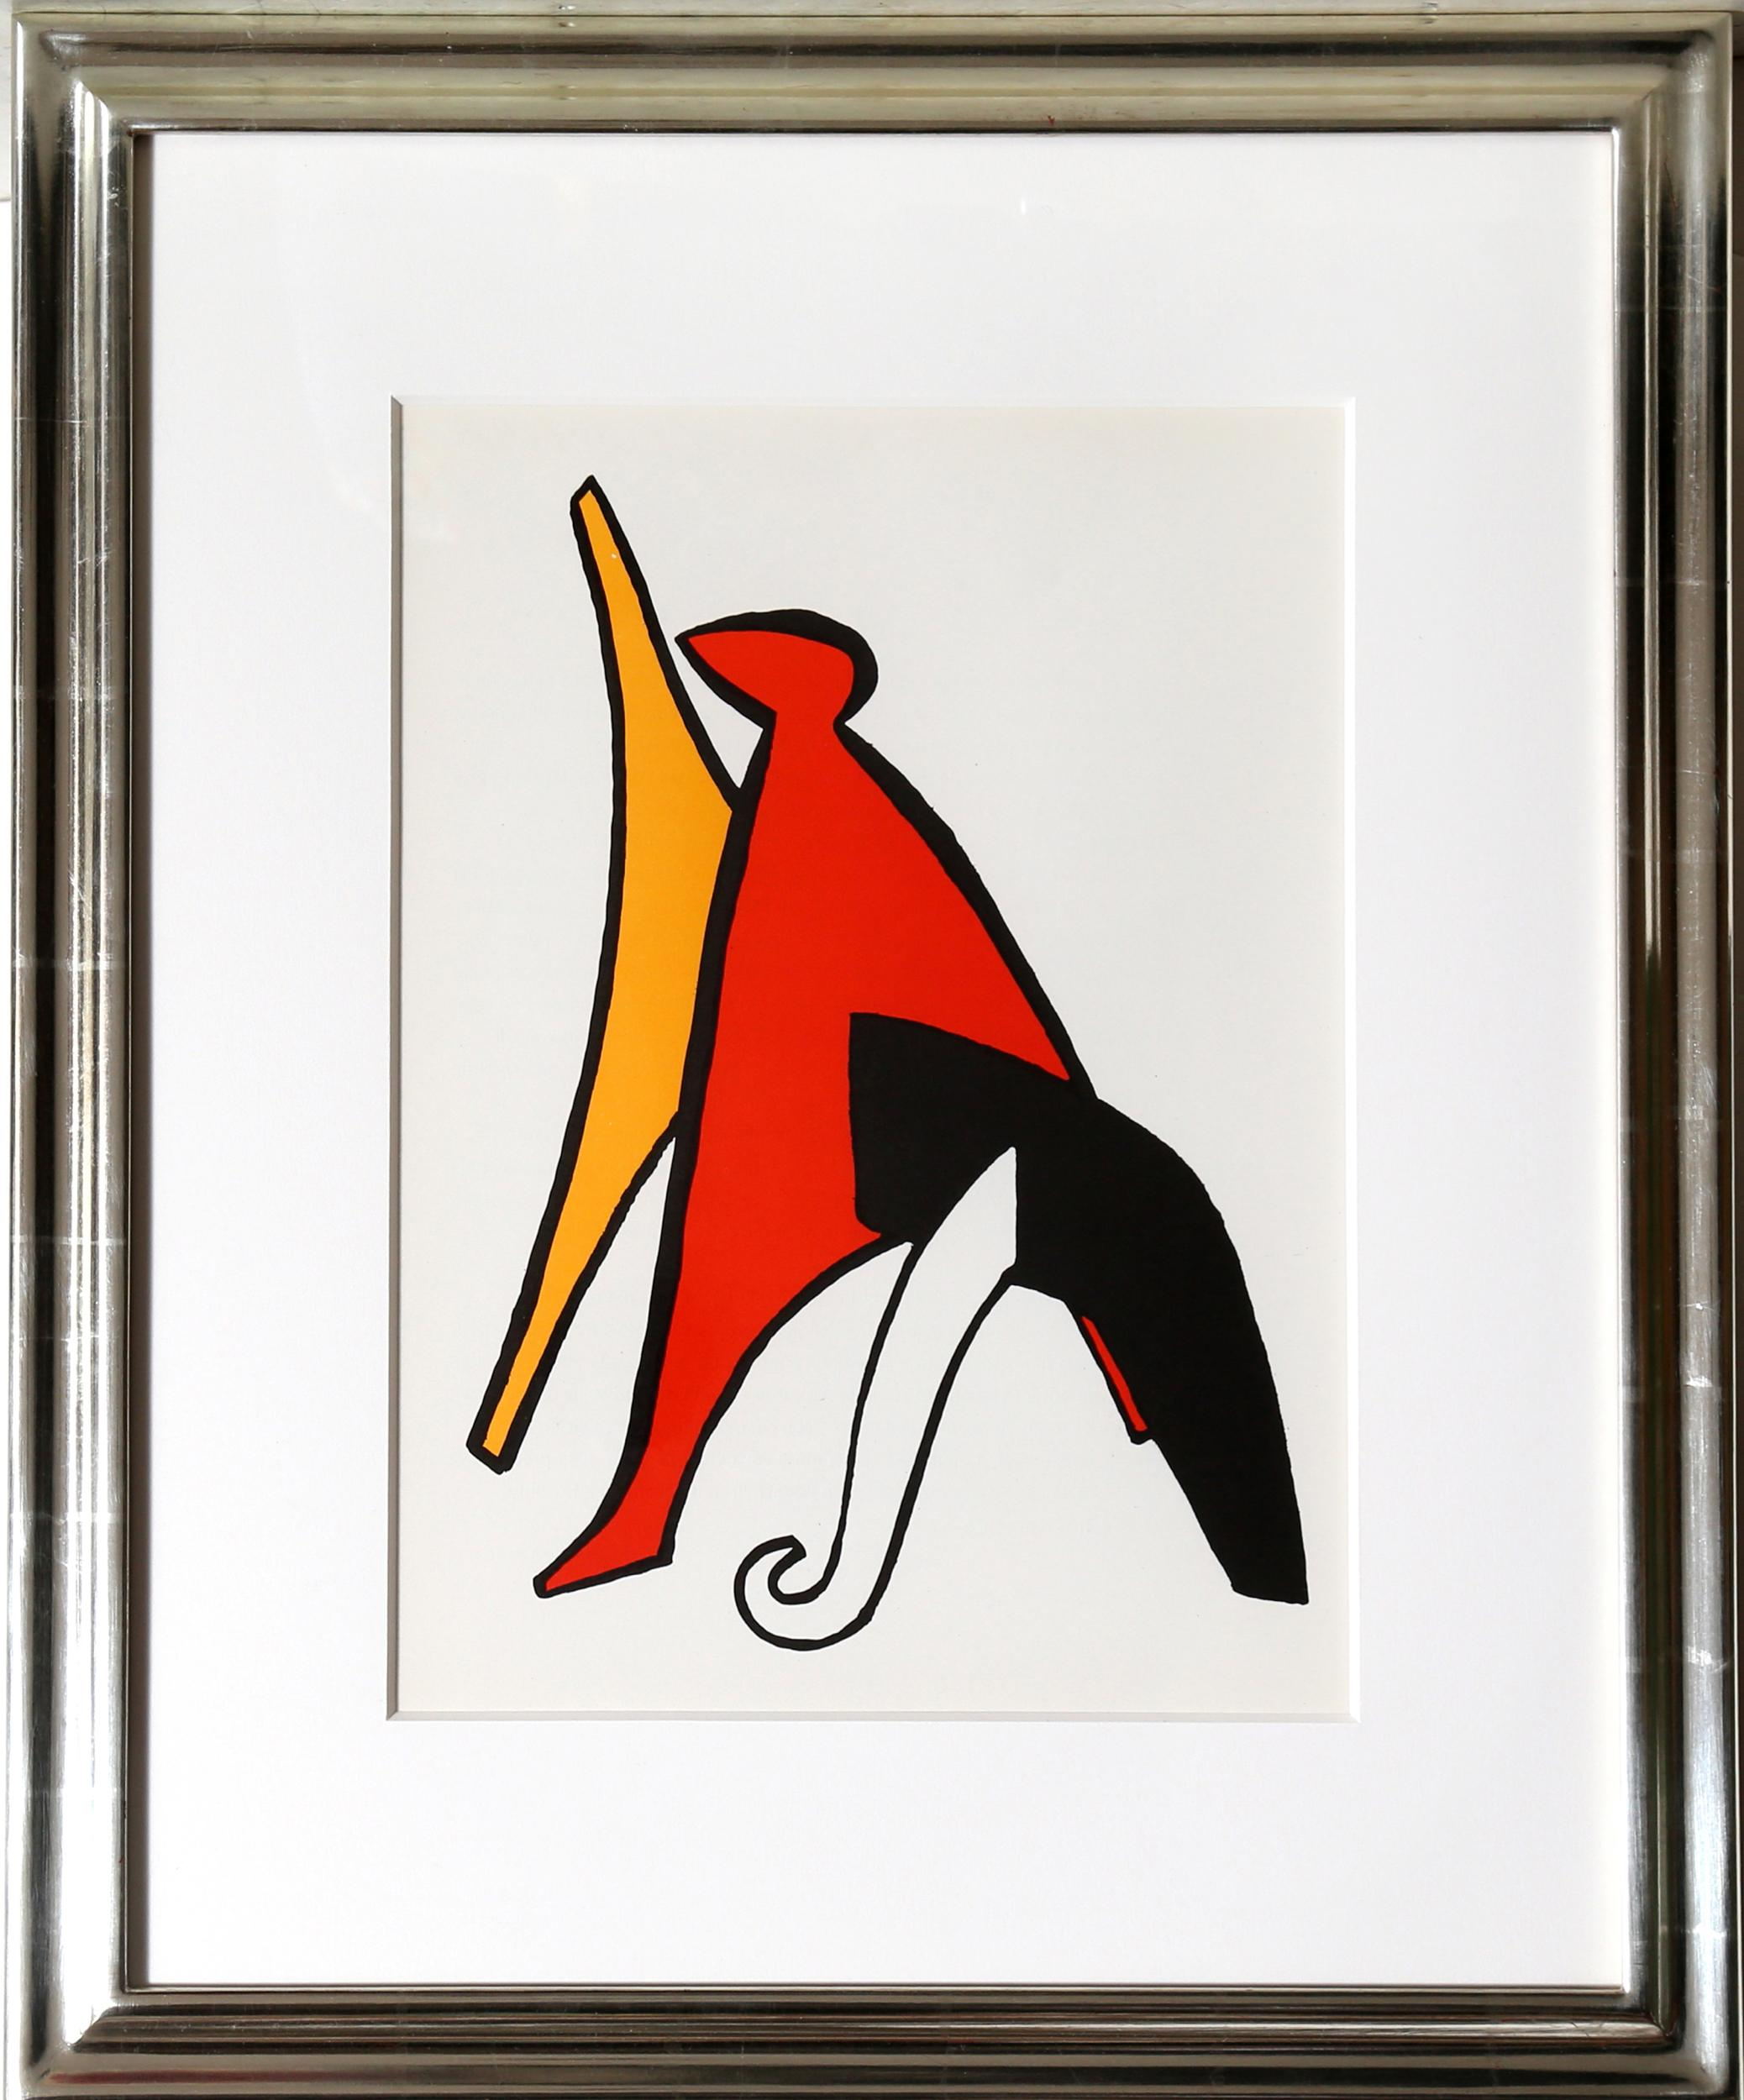 Alexander Calder, Stabiles V, Lithograph